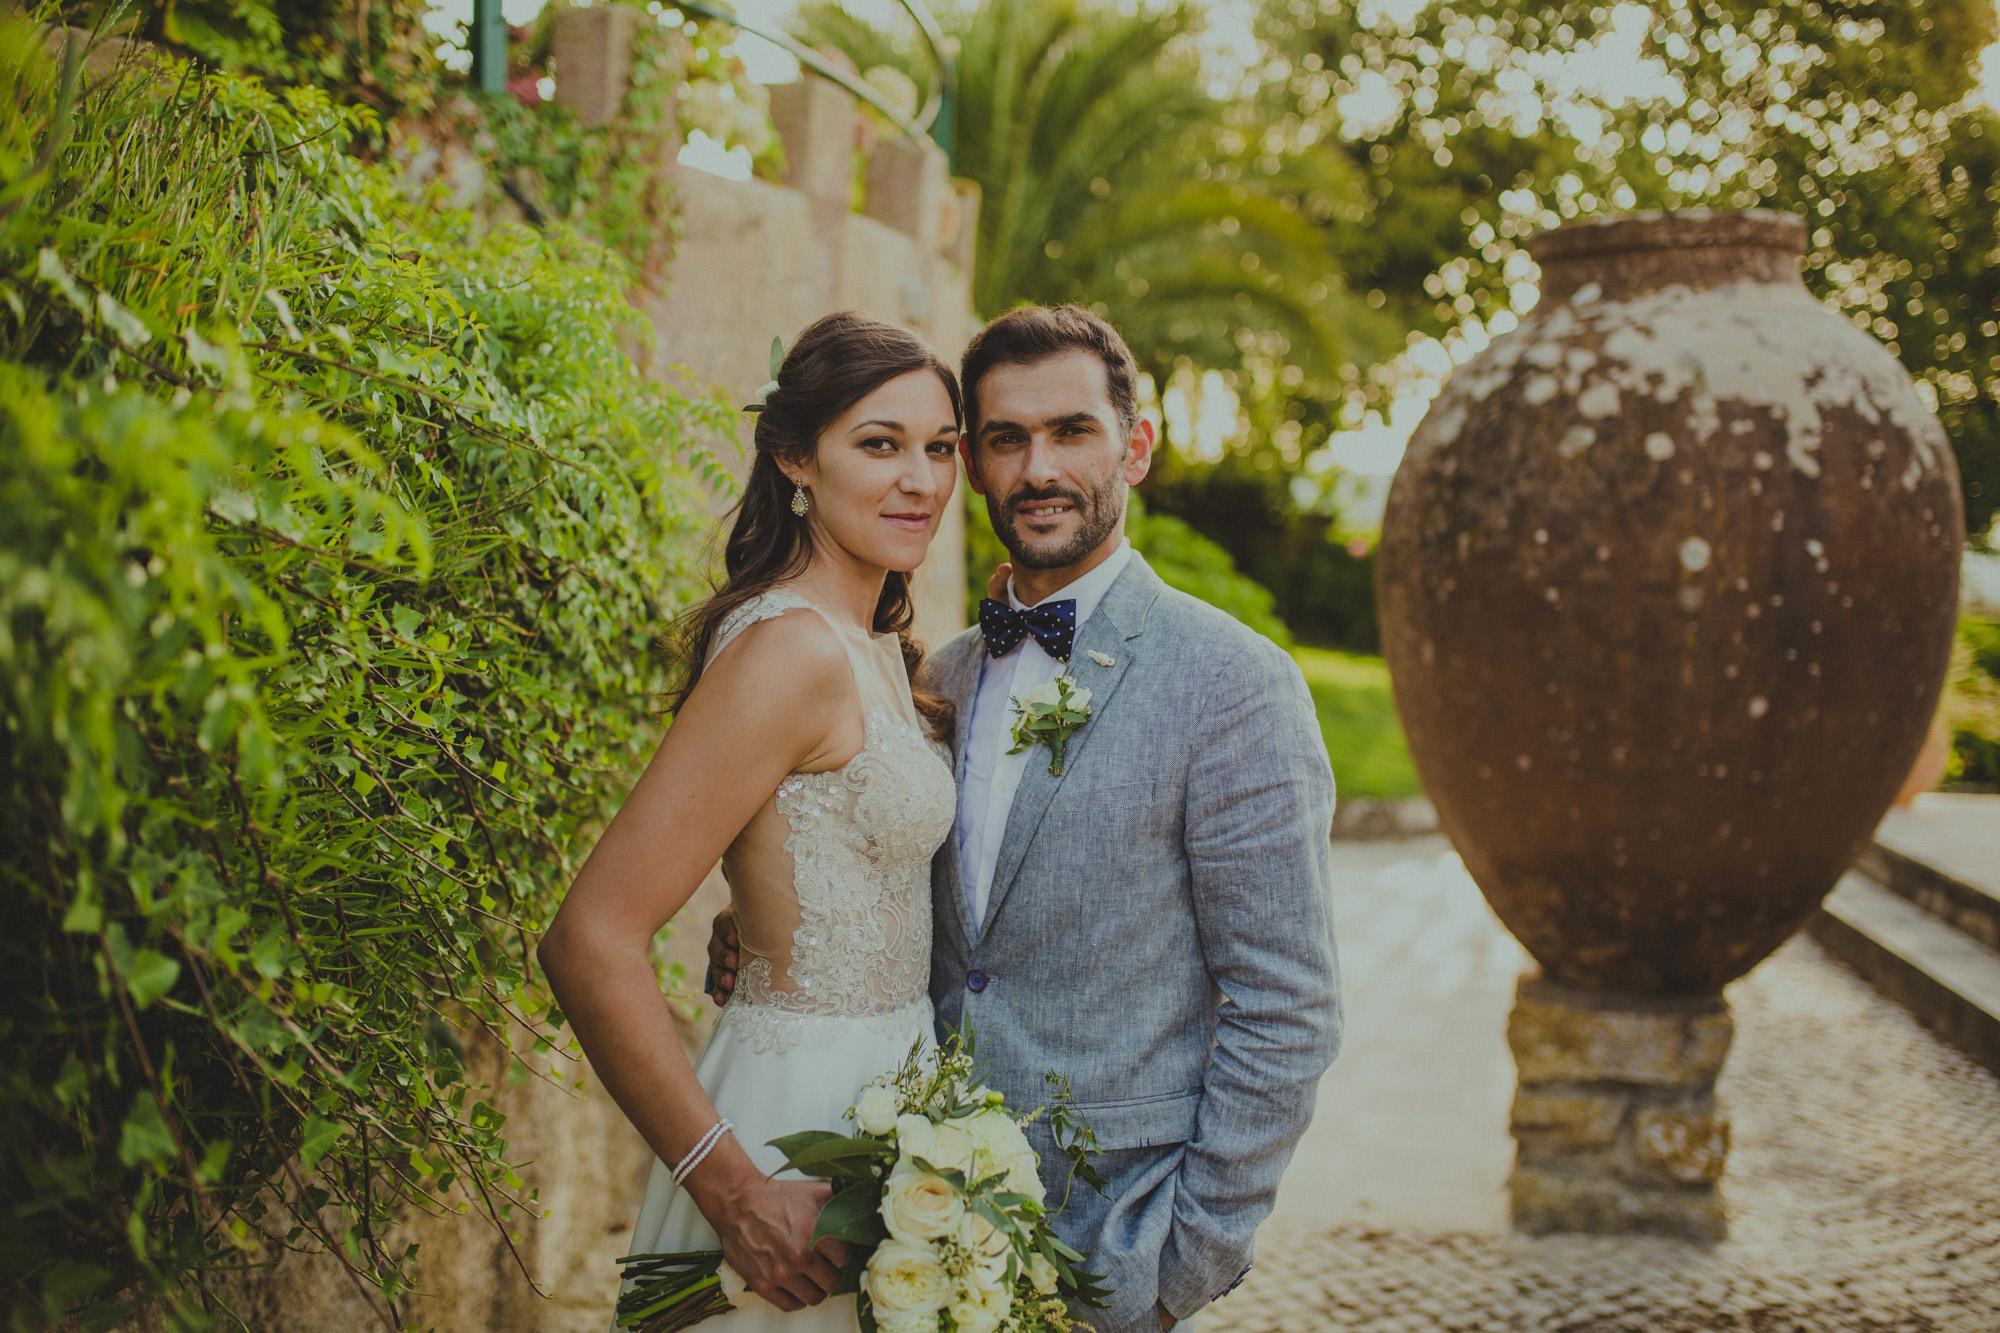 034-carina-e-samuel-wedding-casamento-quinta-dos-rouxinois-rustico-my-fancy-wedding-mafra-malveira-lisboa-sintra-cascais-filipe-santiago-fotografia-fotografo-lifestyle-destination-portugal